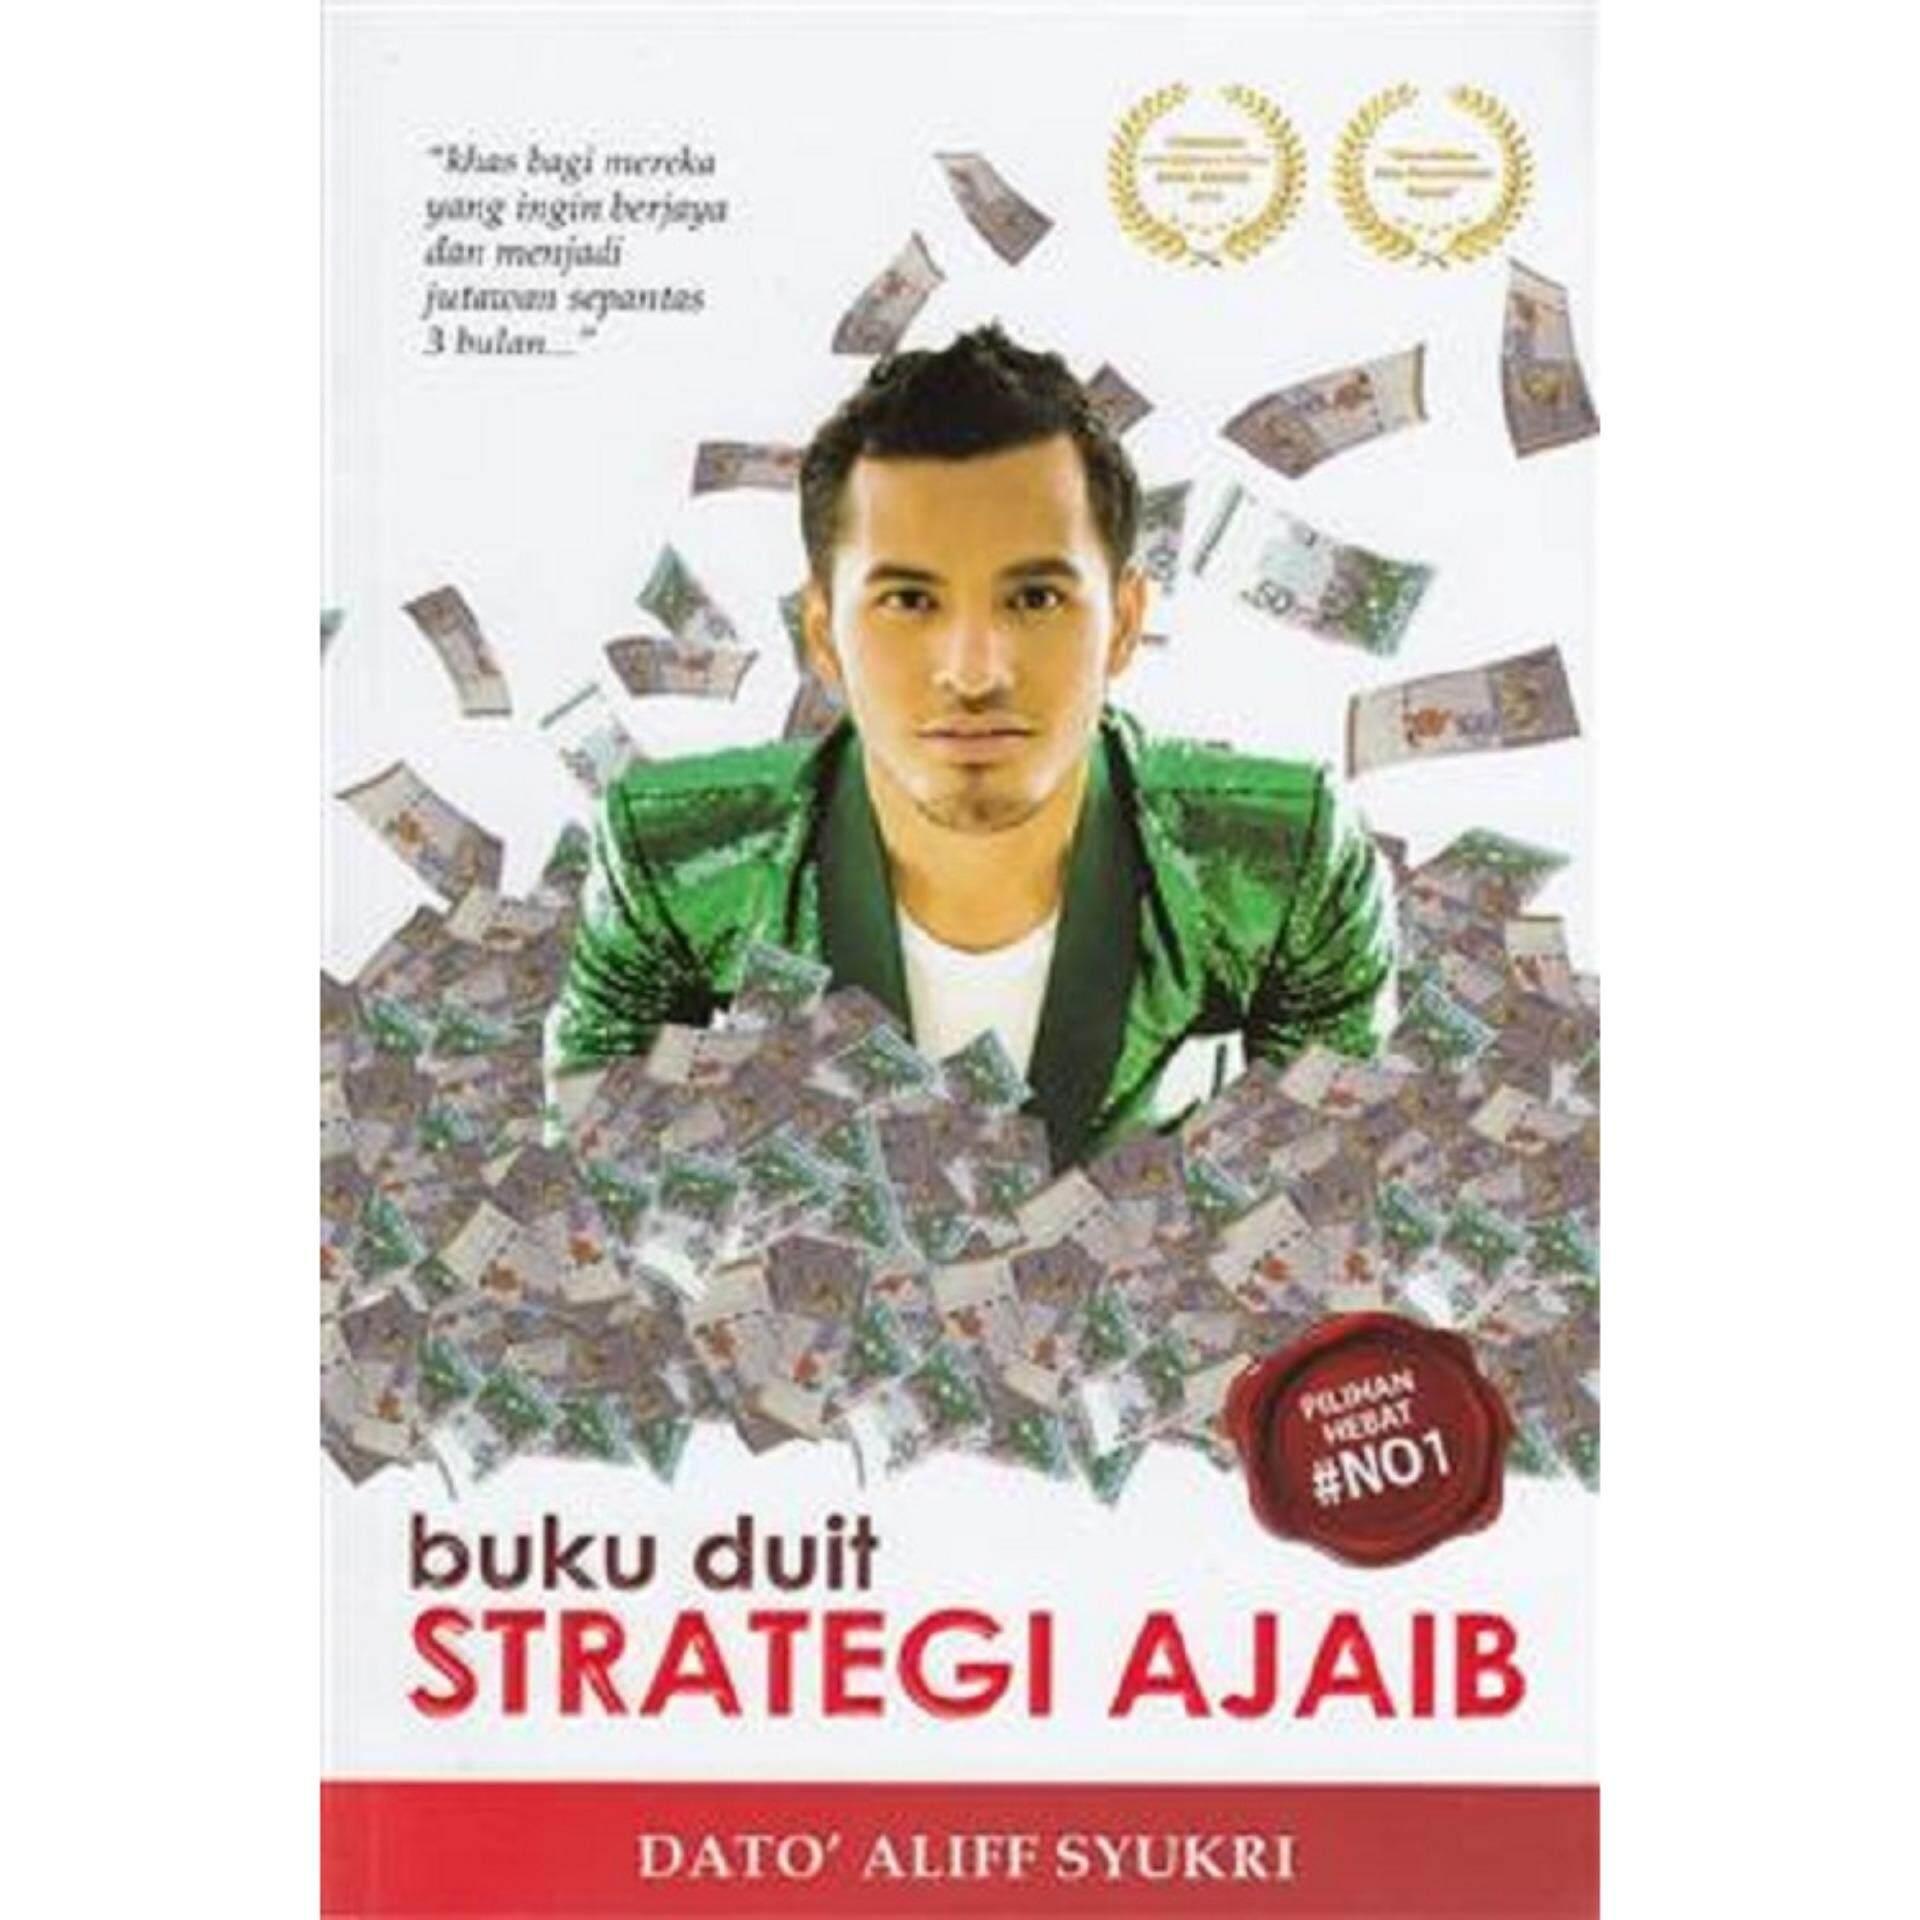 Buku Duit Strategi Ajaib  ISBN : 9789671345054 Author :  Dato` Aliff Syukri Kamarzaman